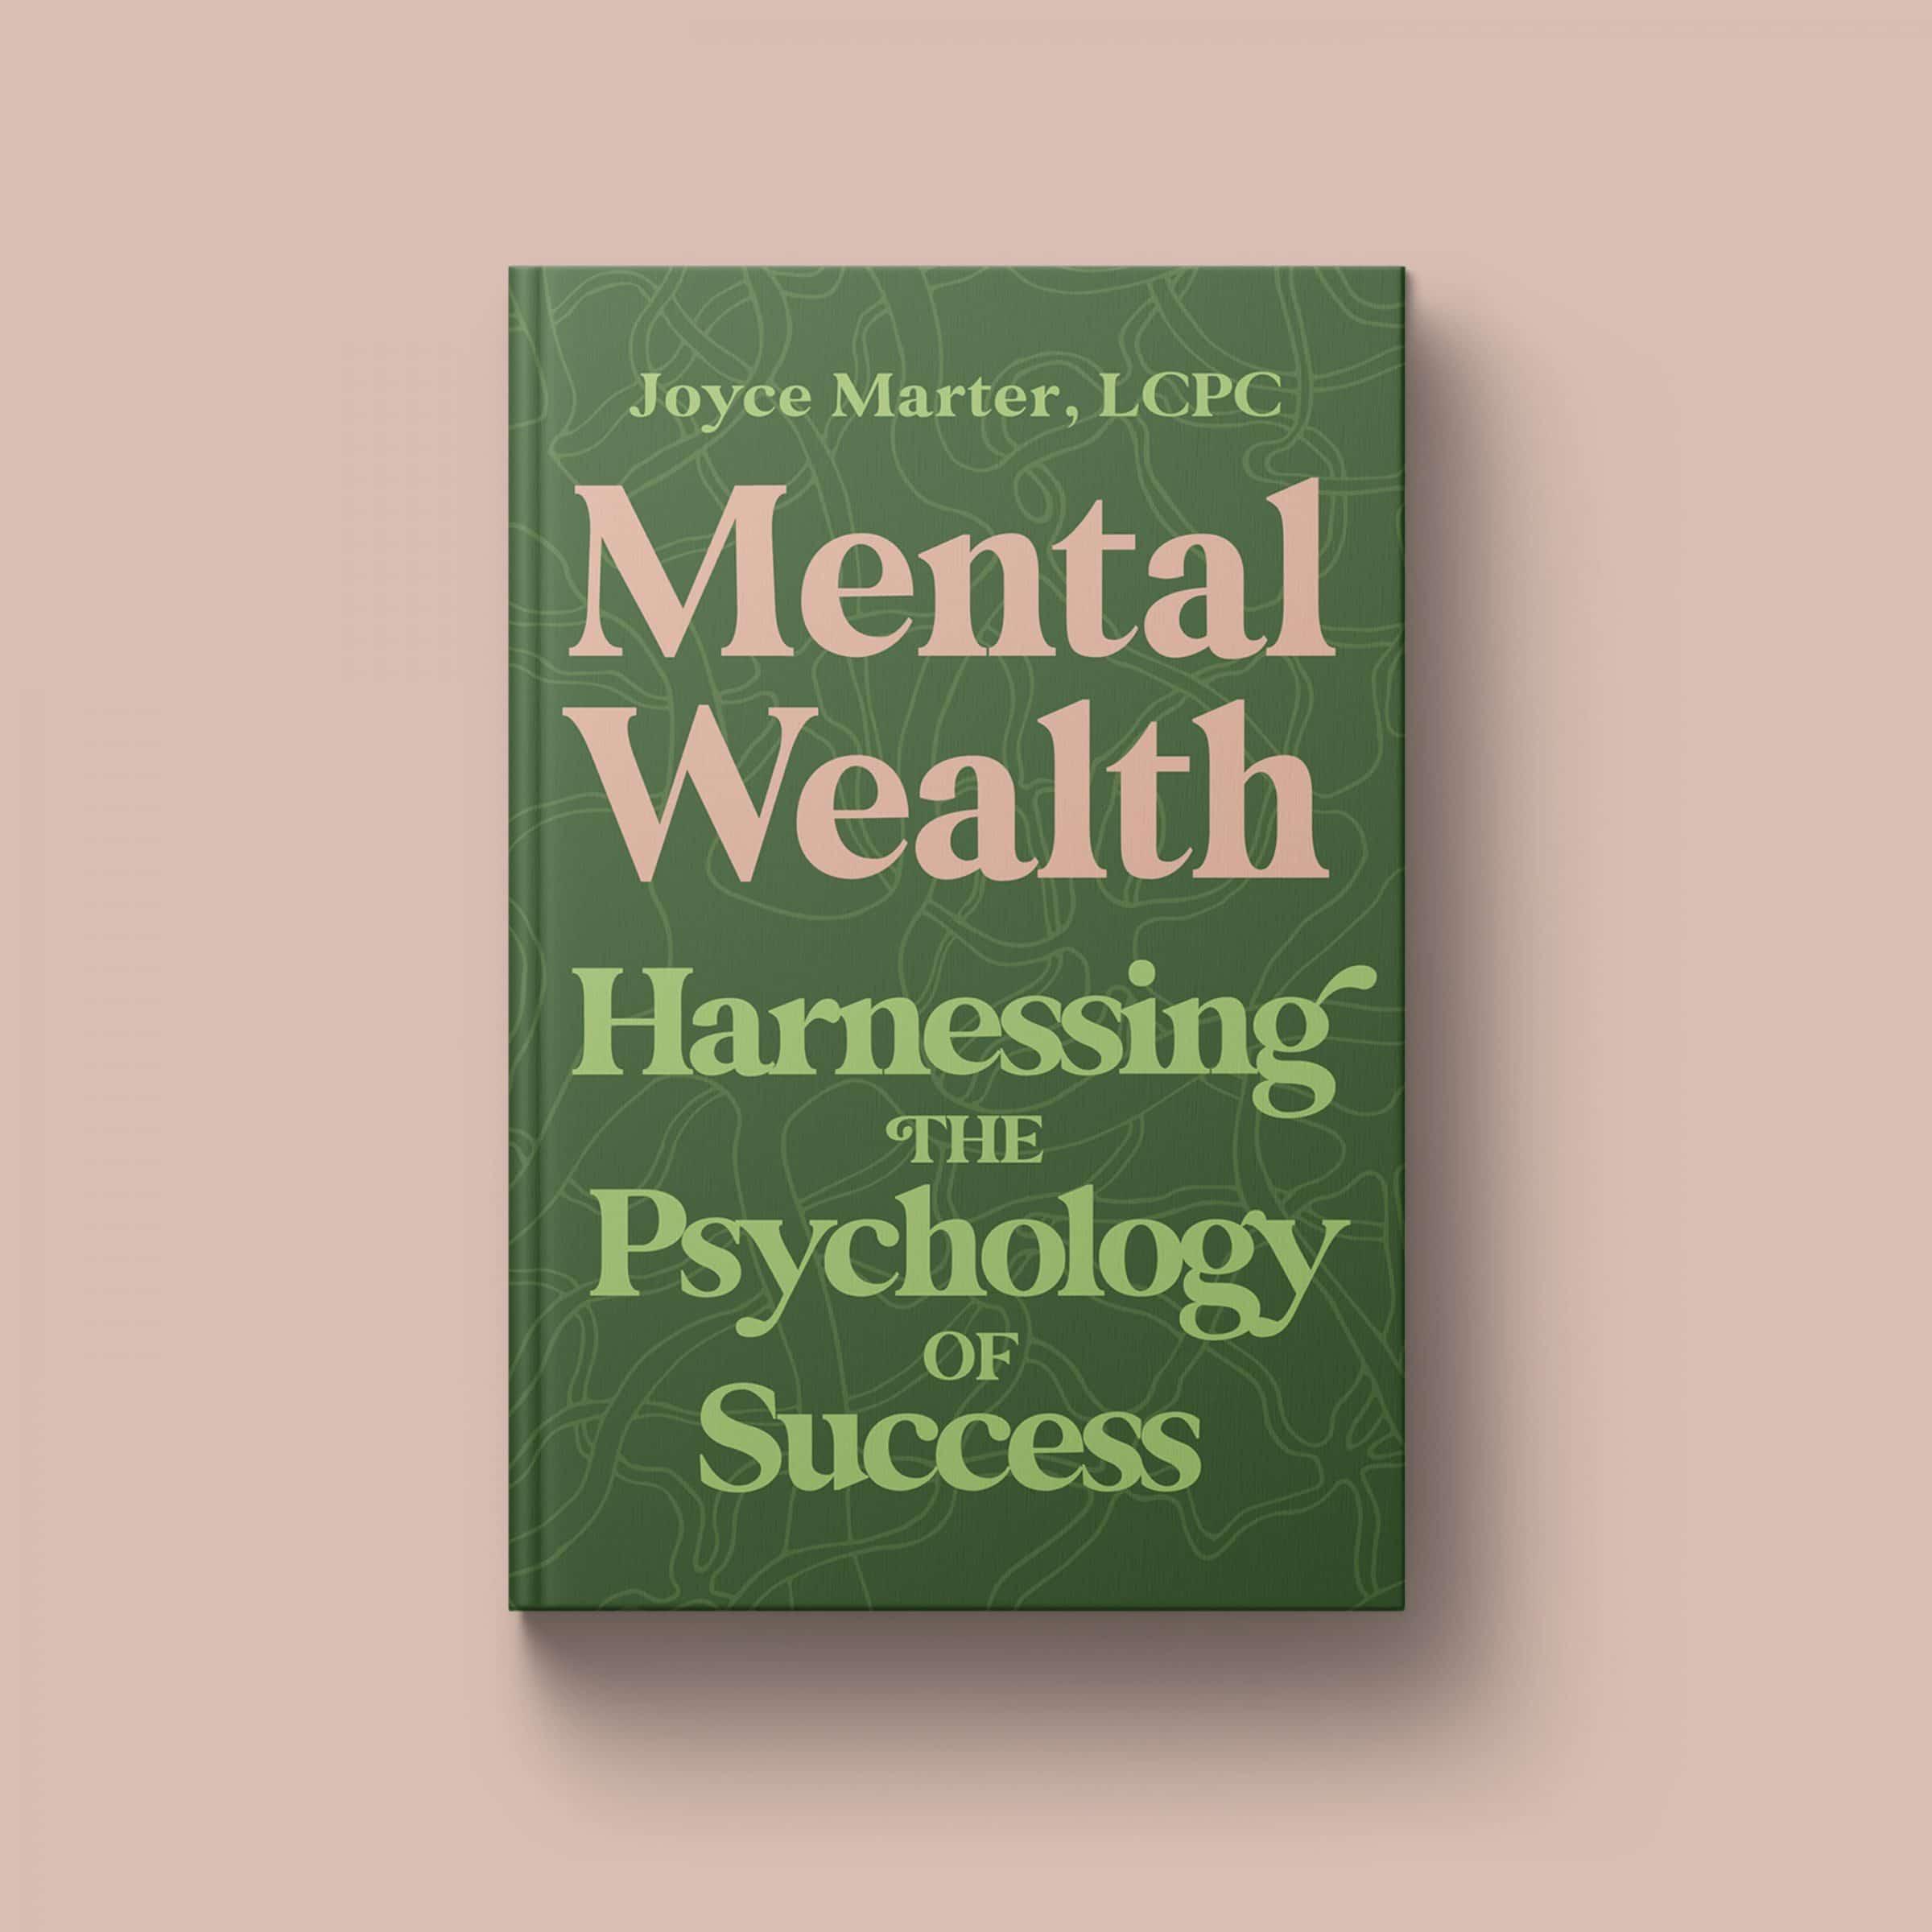 mental-wealth-joyce-marter-cover-art-3-scaled.jpg